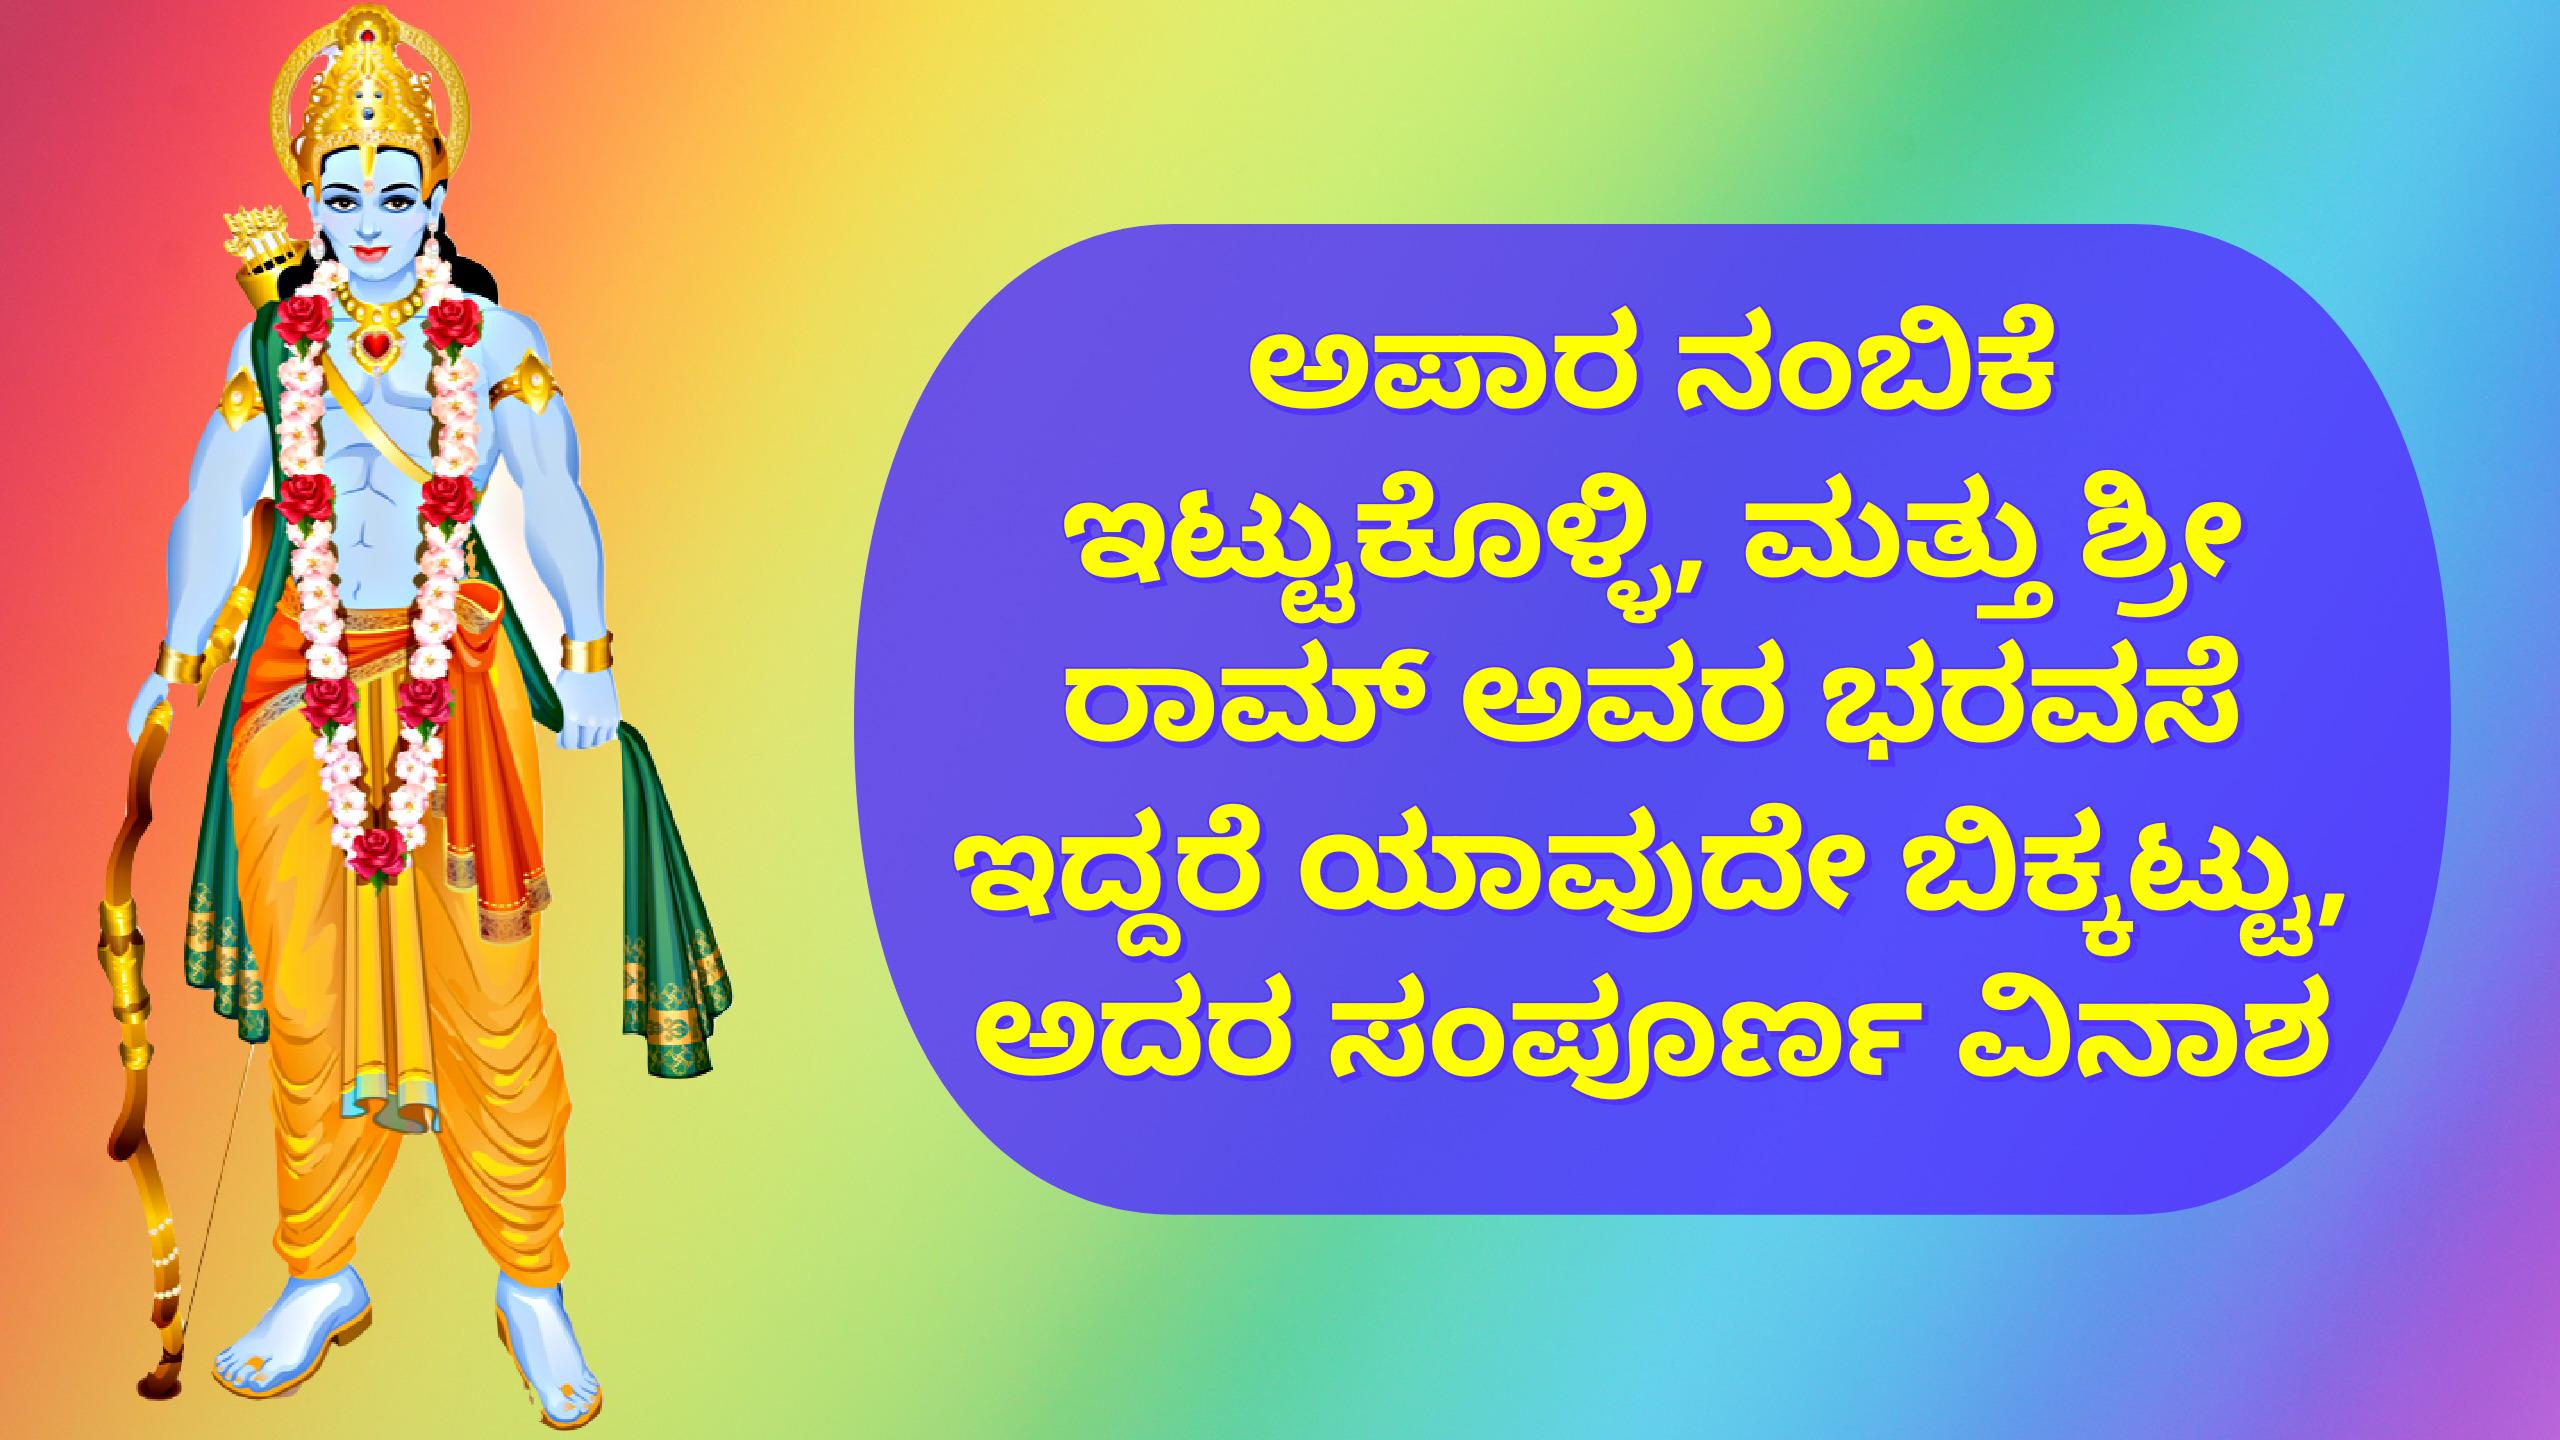 22. Shree Ram Quotes in Kannada